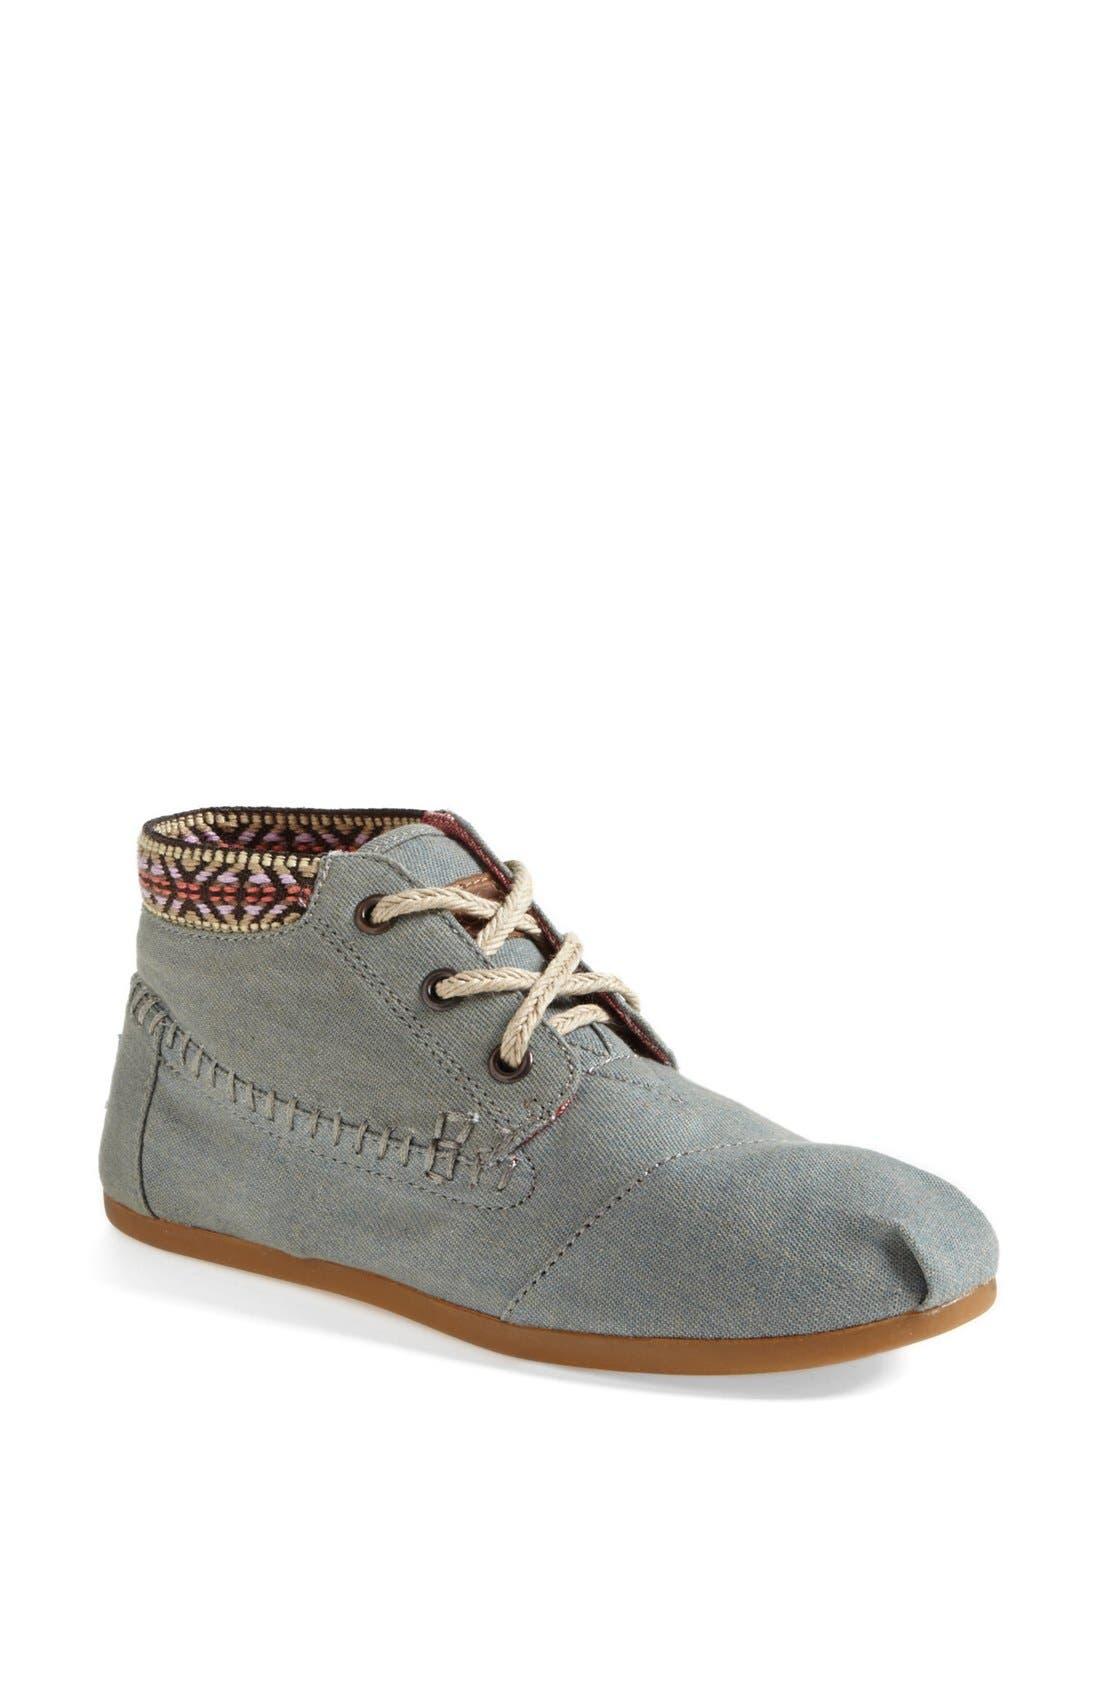 Alternate Image 1 Selected - TOMS 'Desert' Burlap & Cotton Boot (Women)